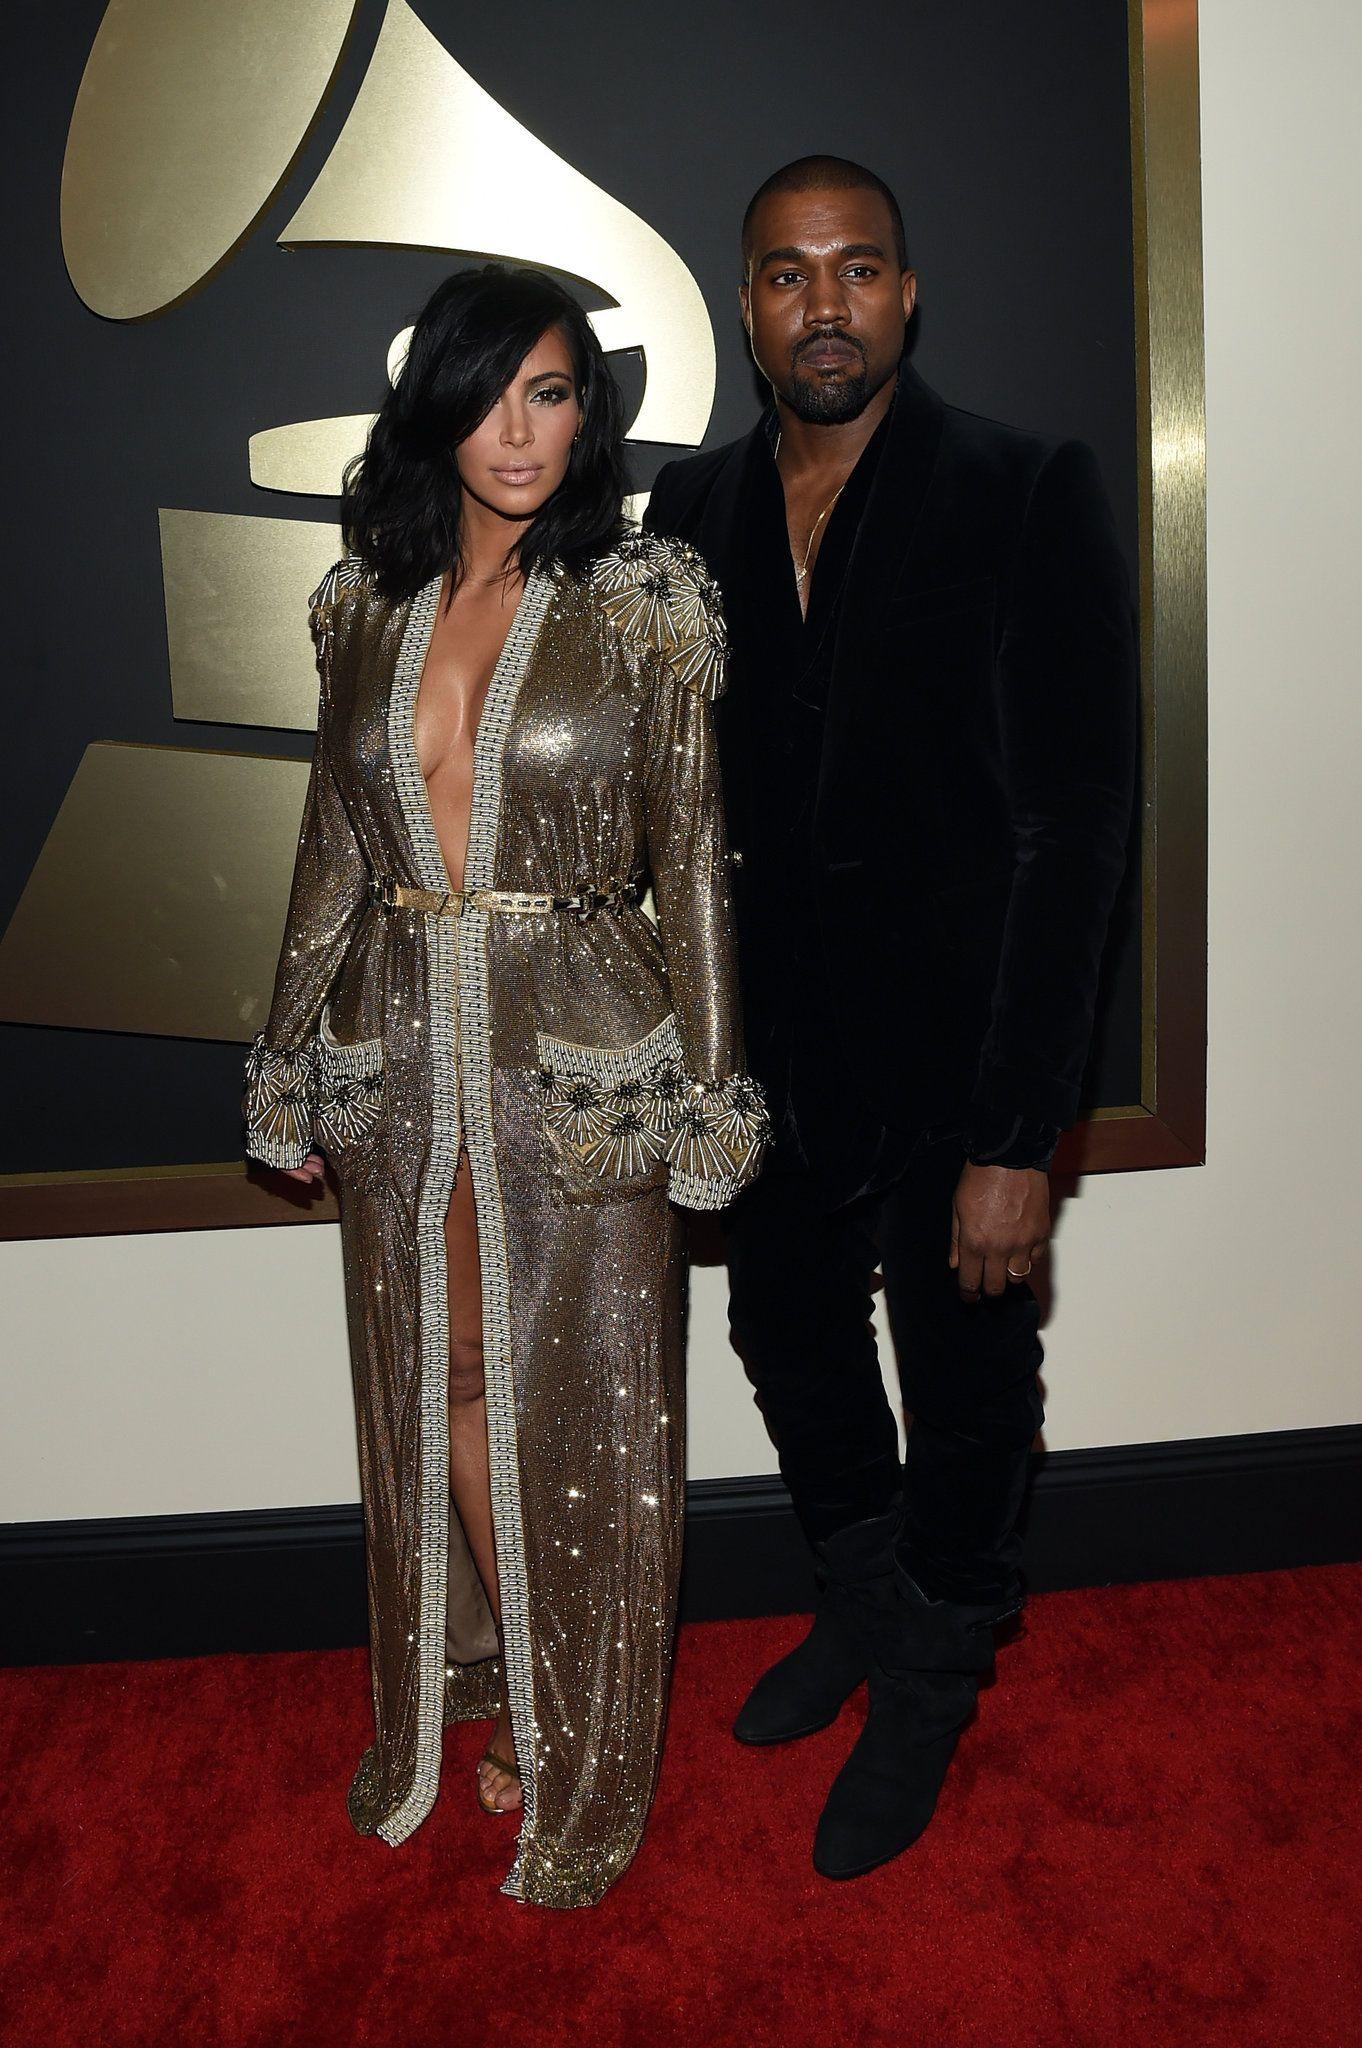 Grammy Awards Kim Kardashian Kanye West Kim Kardashian And Kanye Grammy Awards Red Carpet